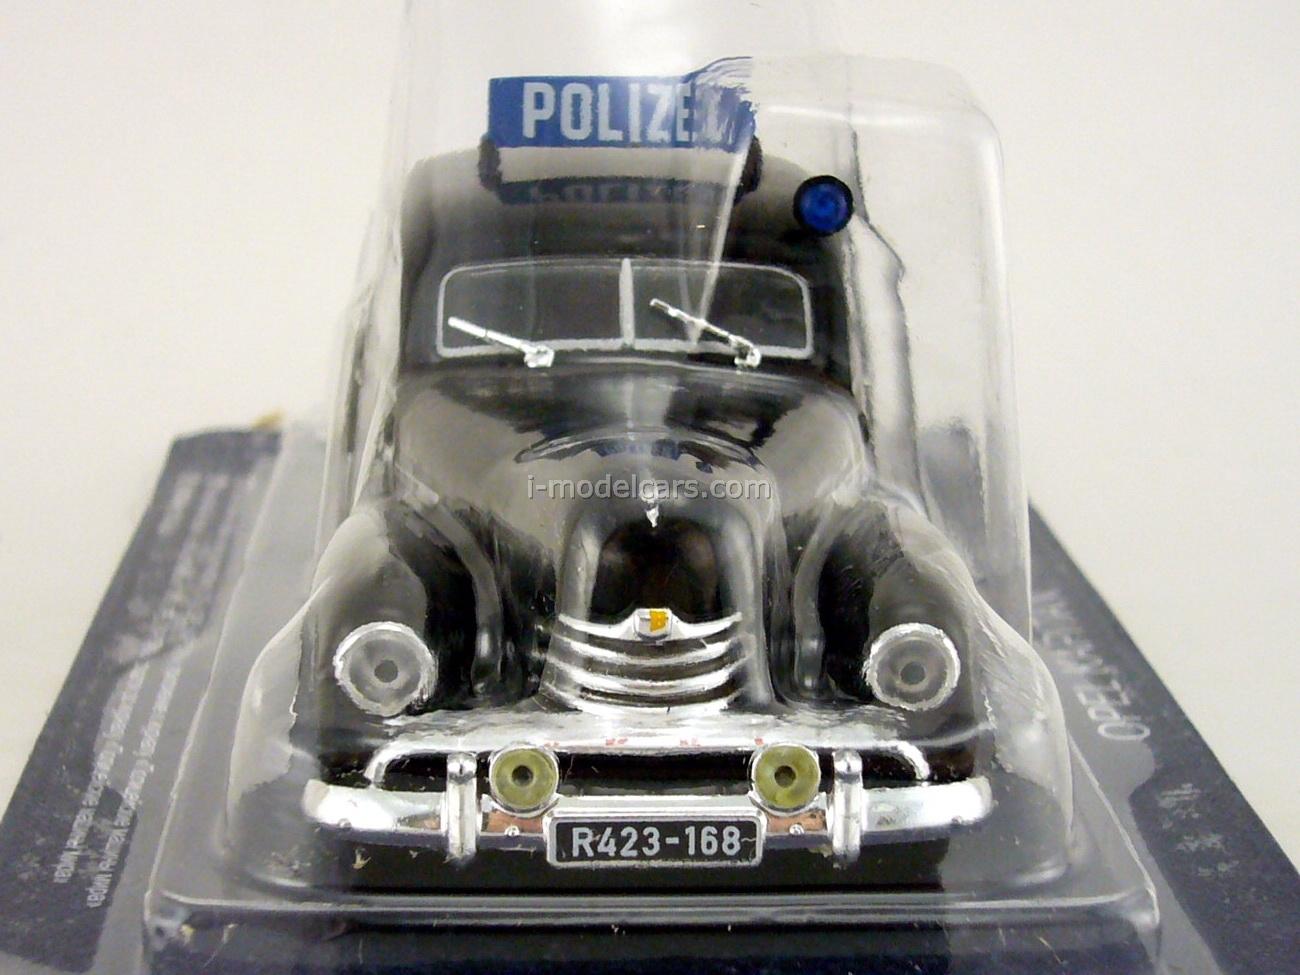 Opel Kapitan 1951 East Germany Police 1:43 DeAgostini World's Police Car #68